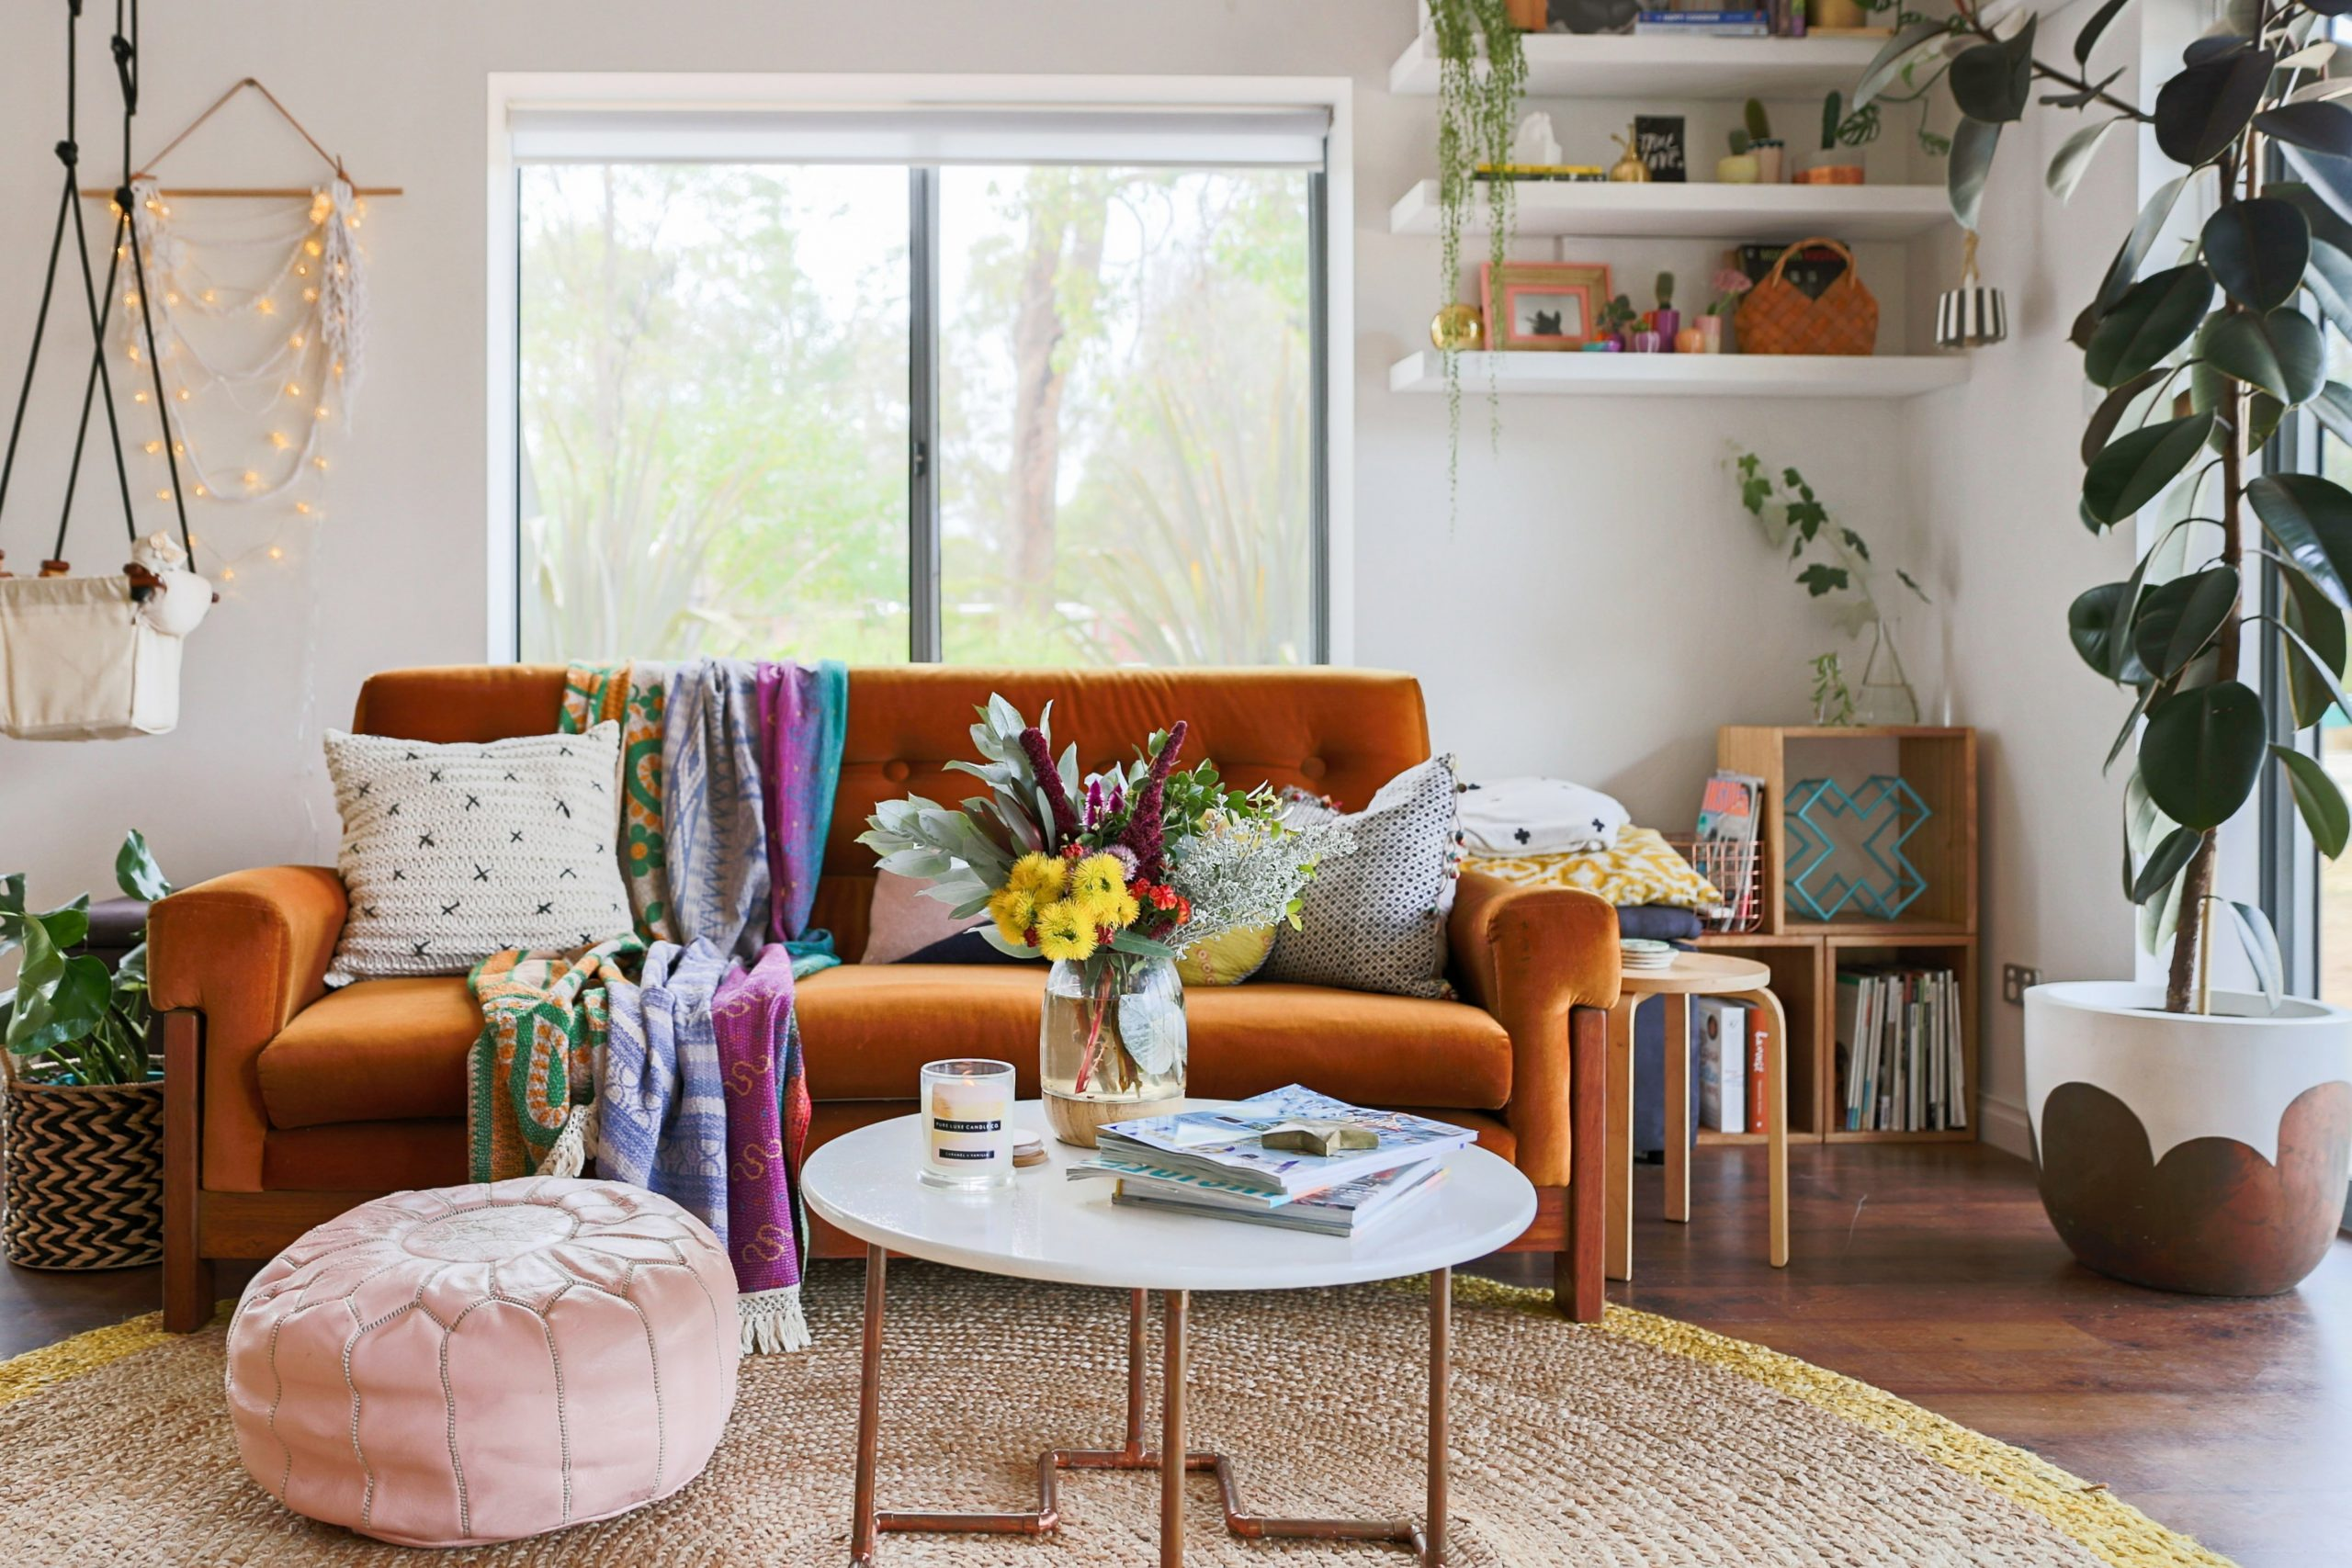 Bohemian Style Decor Ideas from Australian Homes  Apartment Therapy - Small Apartment Decorating Ideas Boho